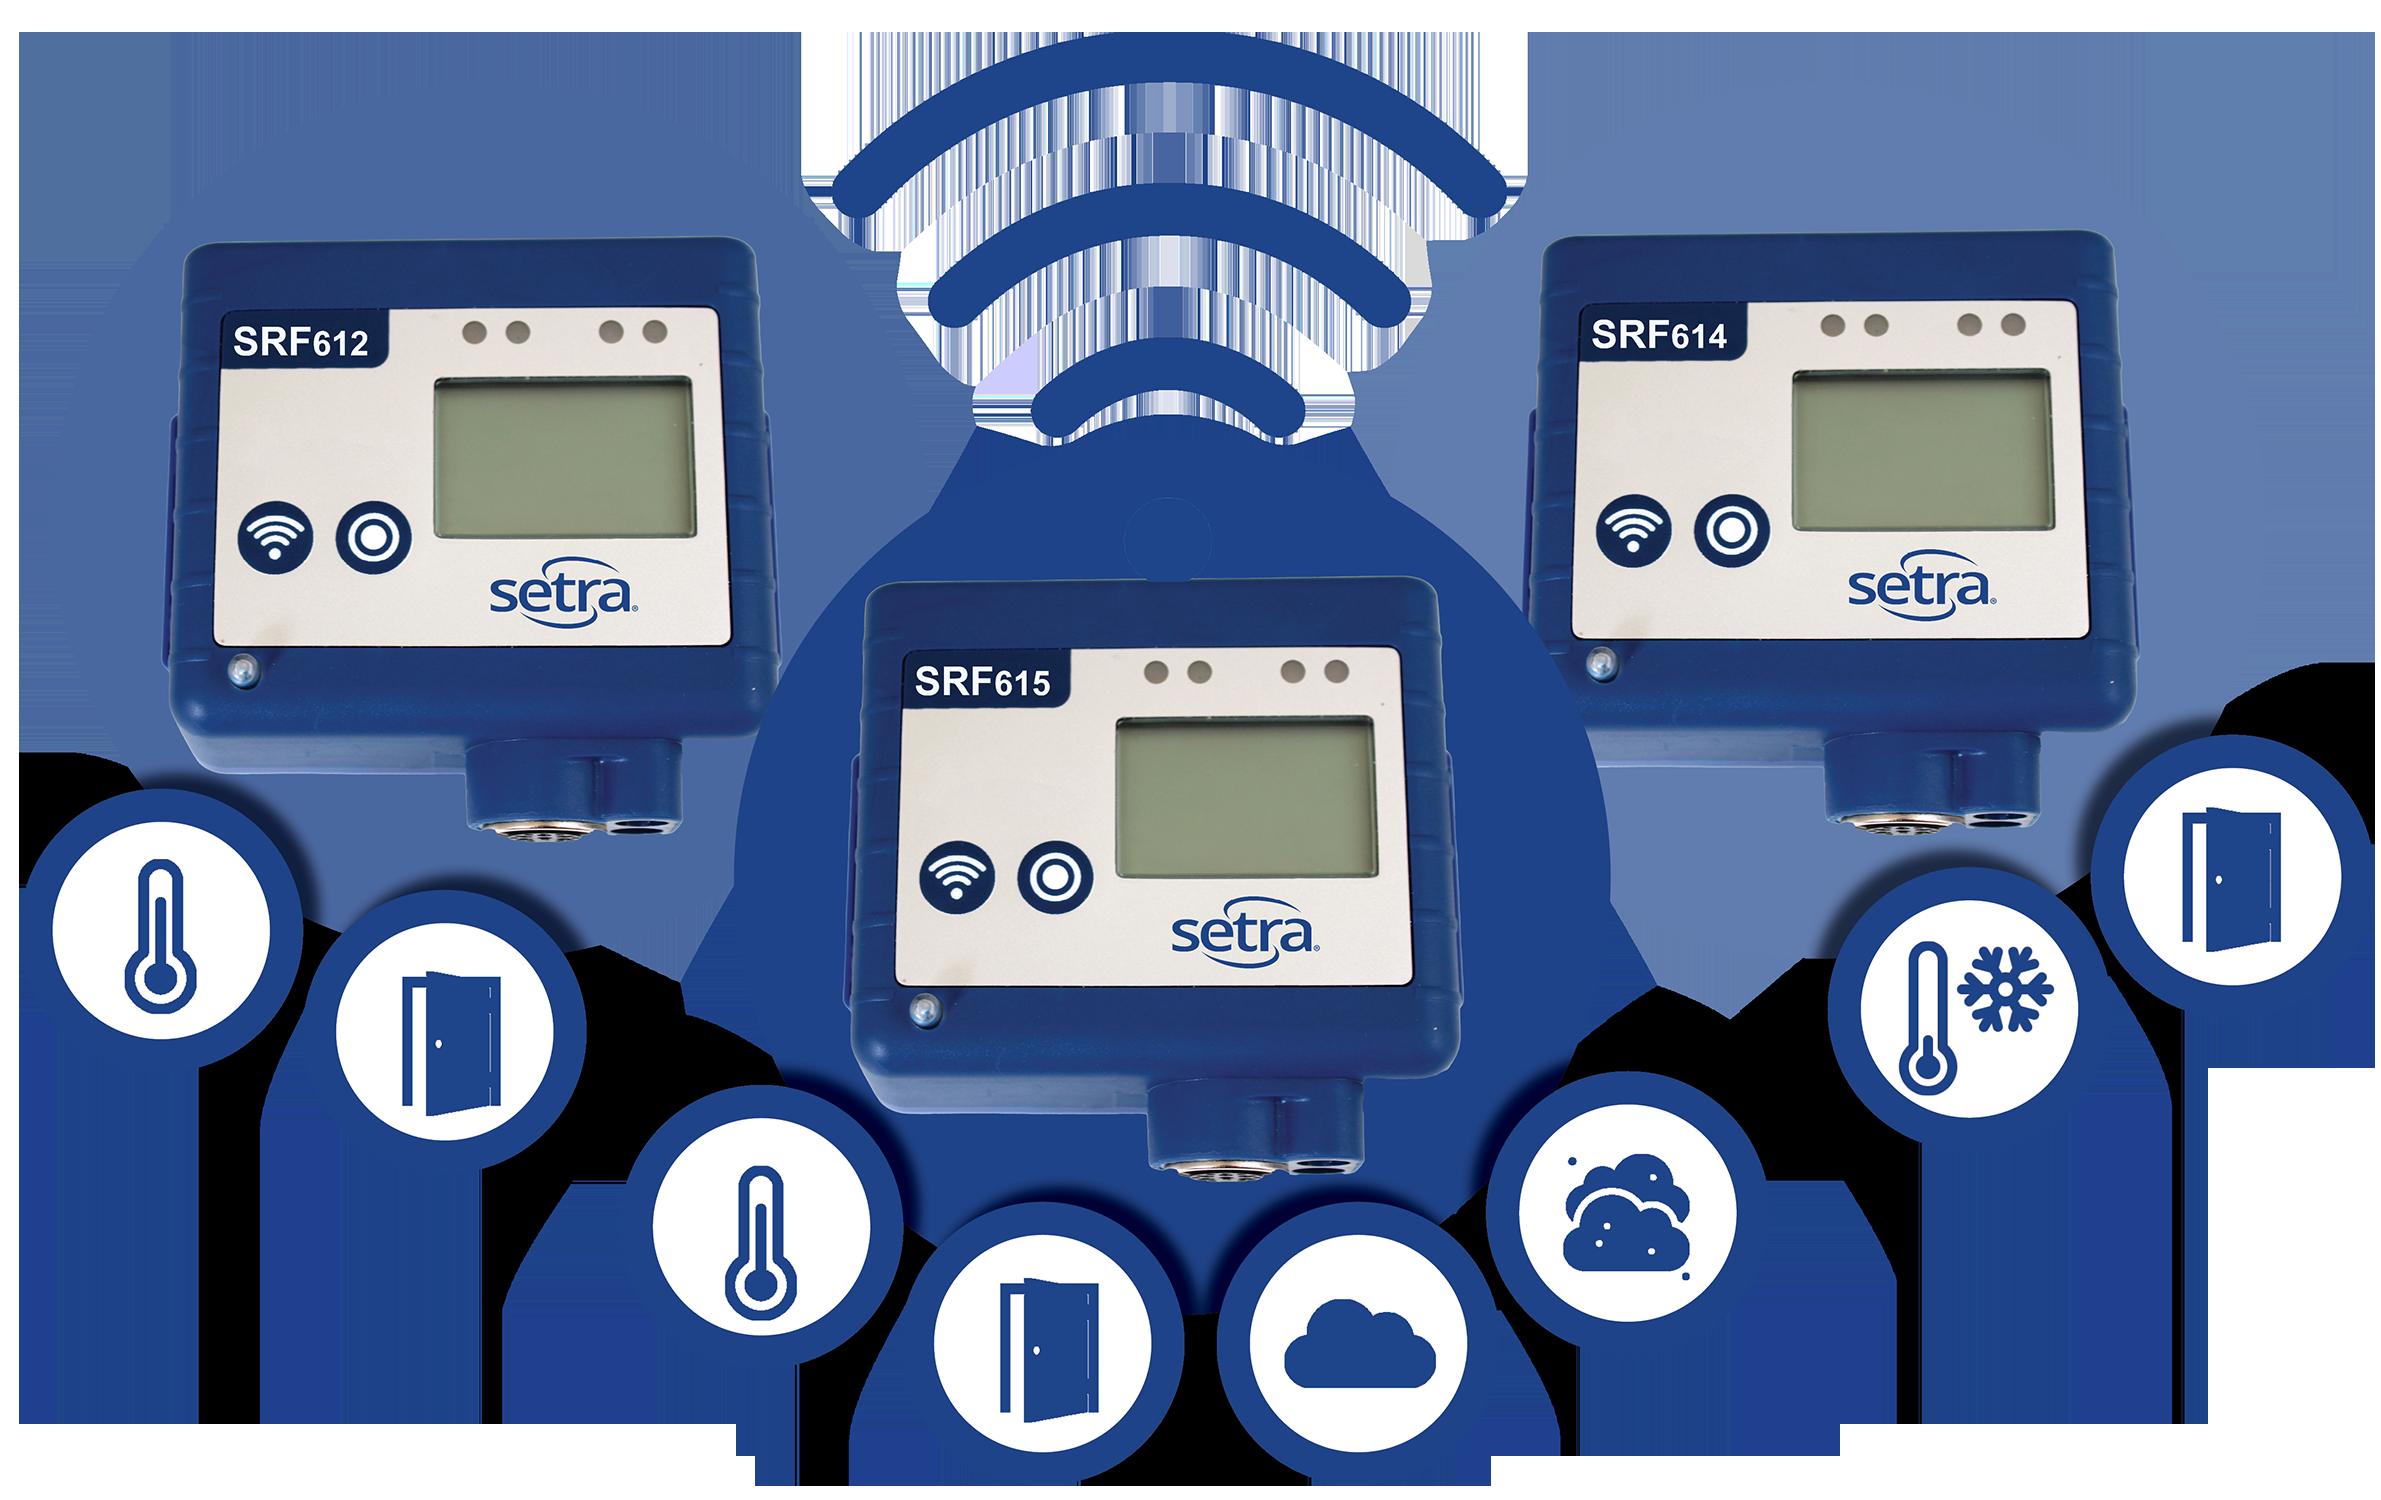 Introducing Setra's Wireless Sensors!